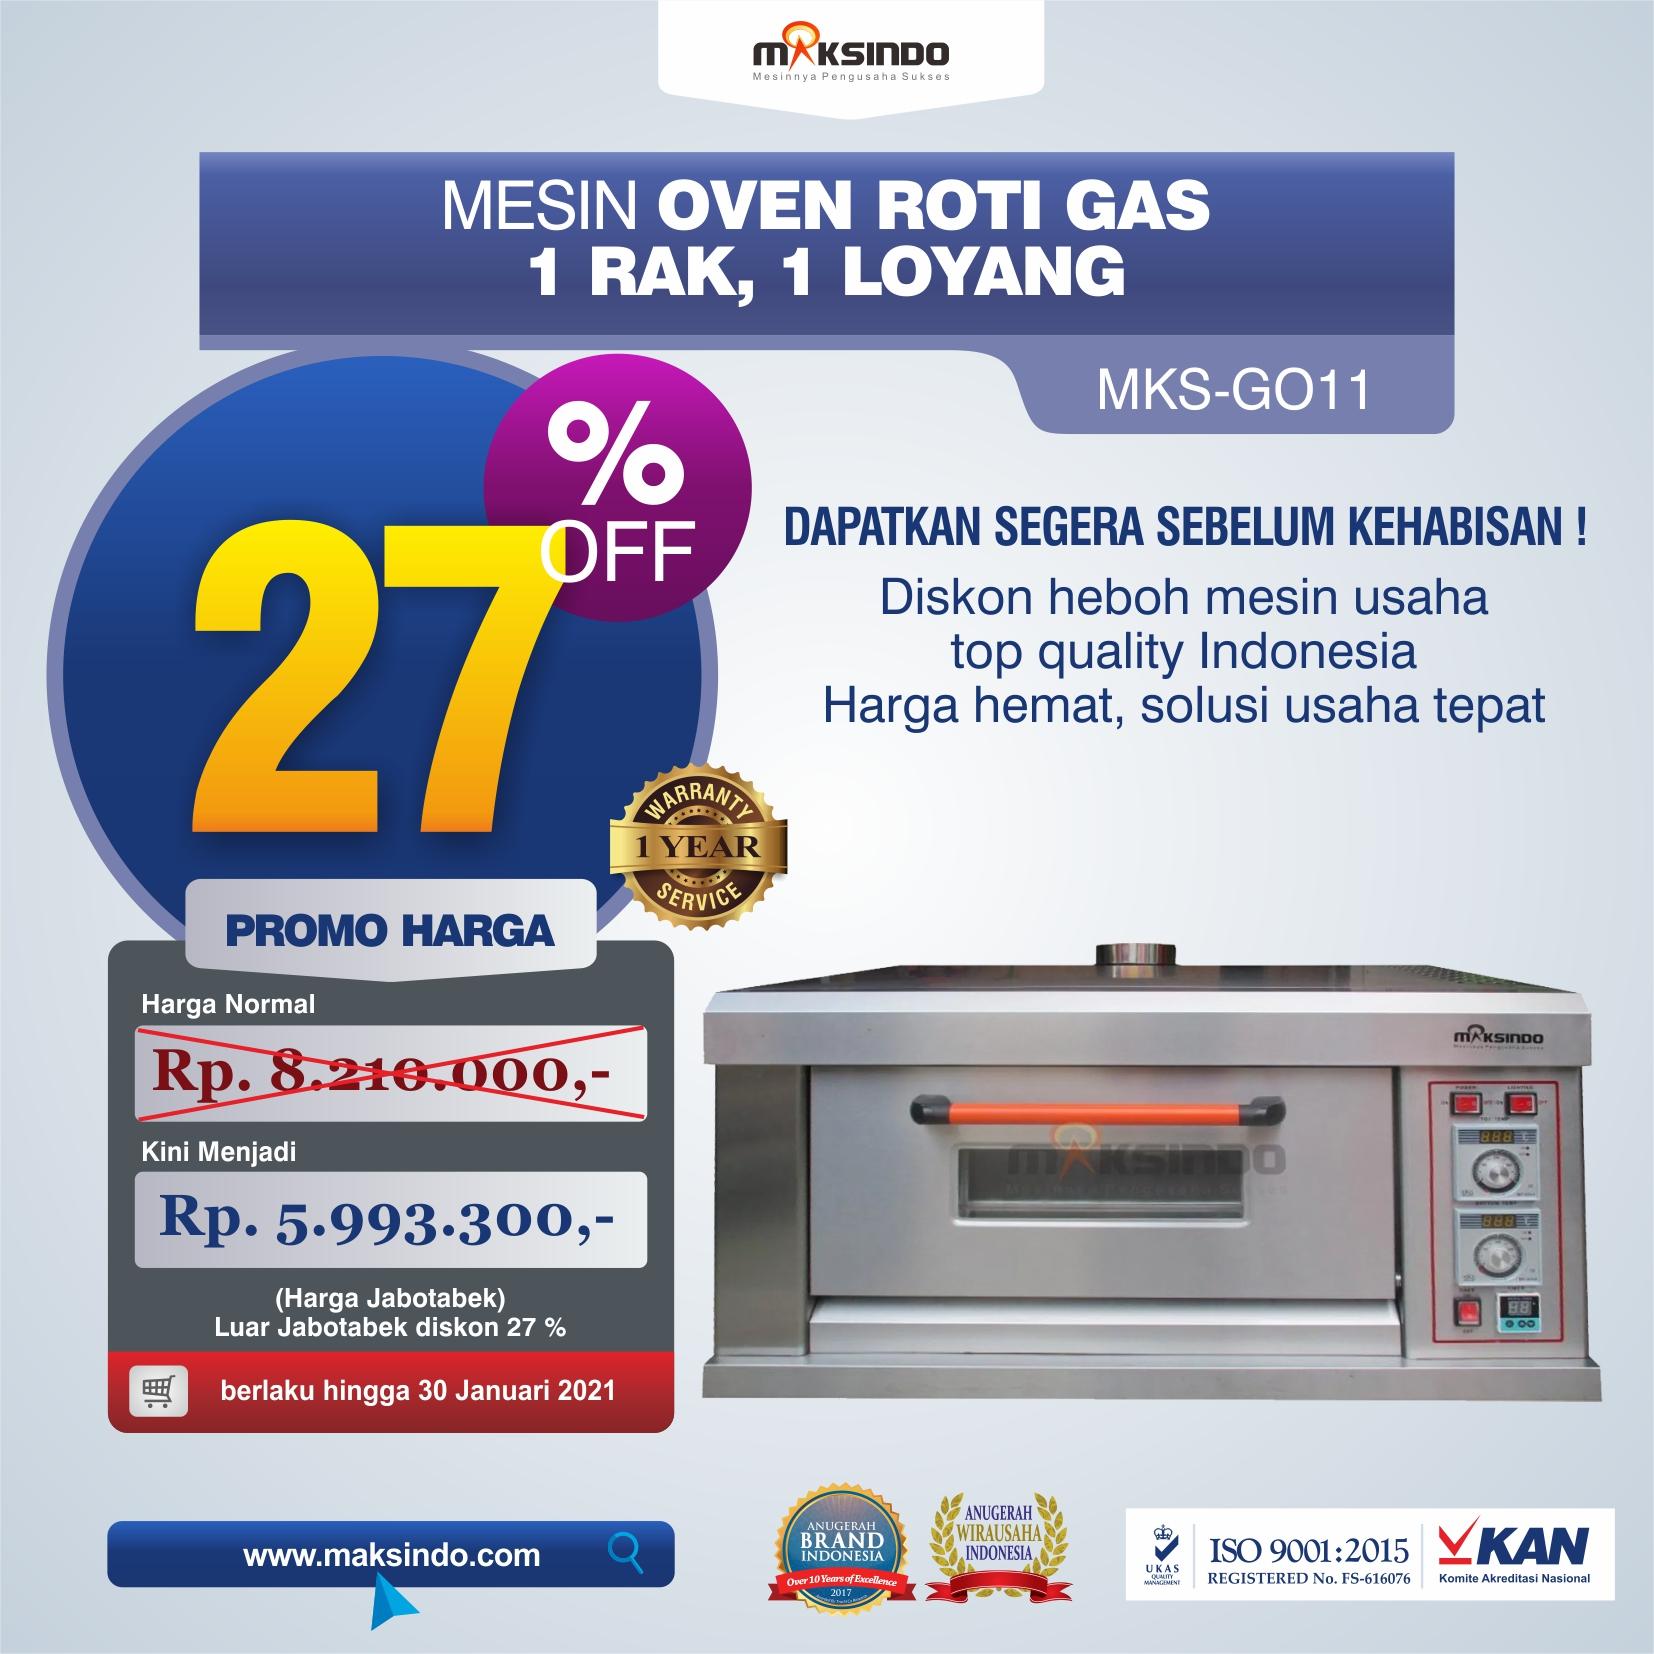 Jual Mesin Oven Roti Gas (MKS-GO11) di Yogyakarta